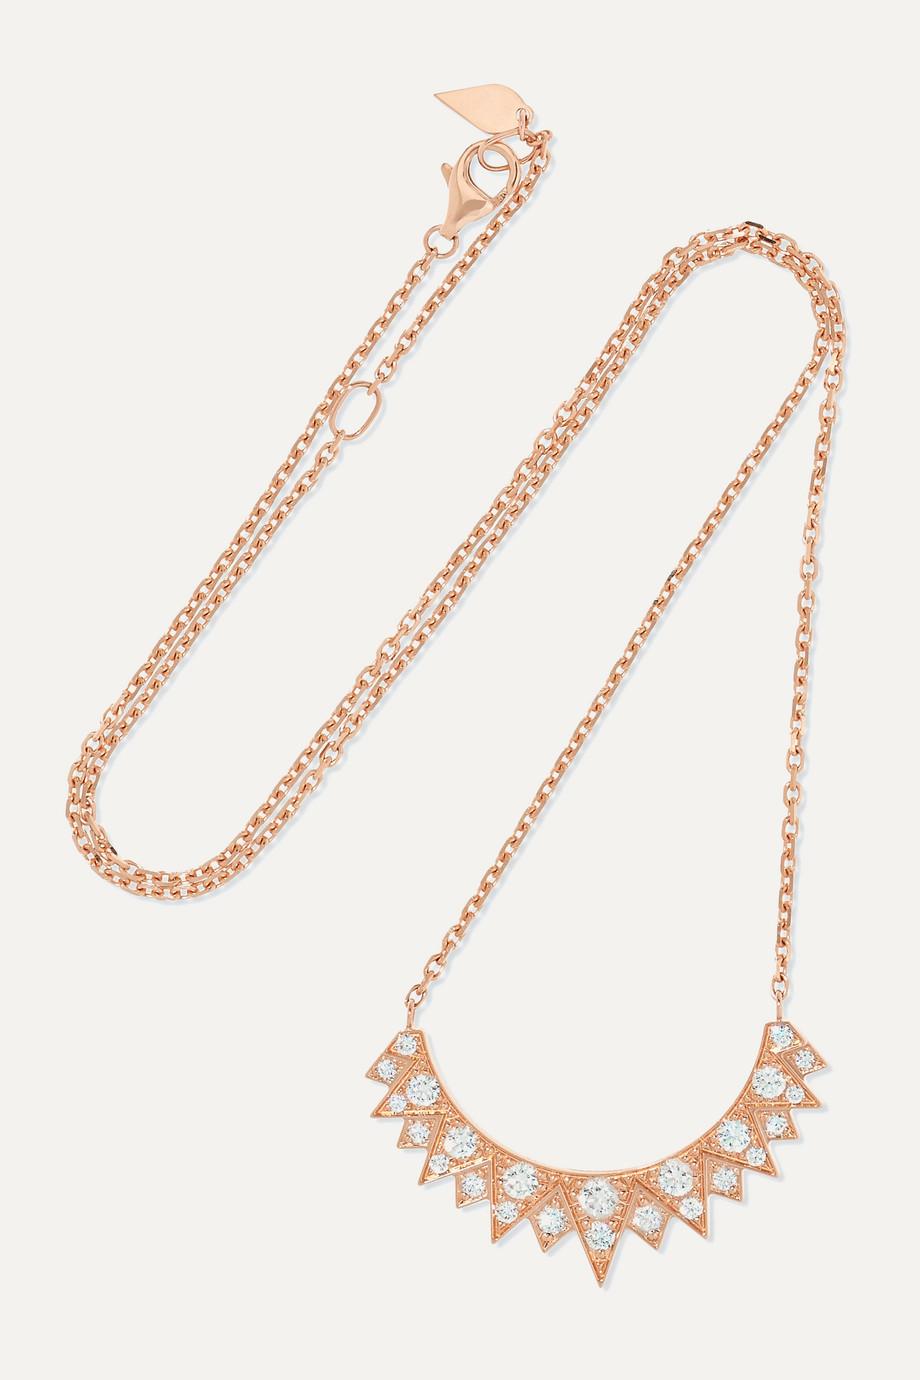 Piaget Sunlight Kette aus 18 Karat Roségold mit Diamanten